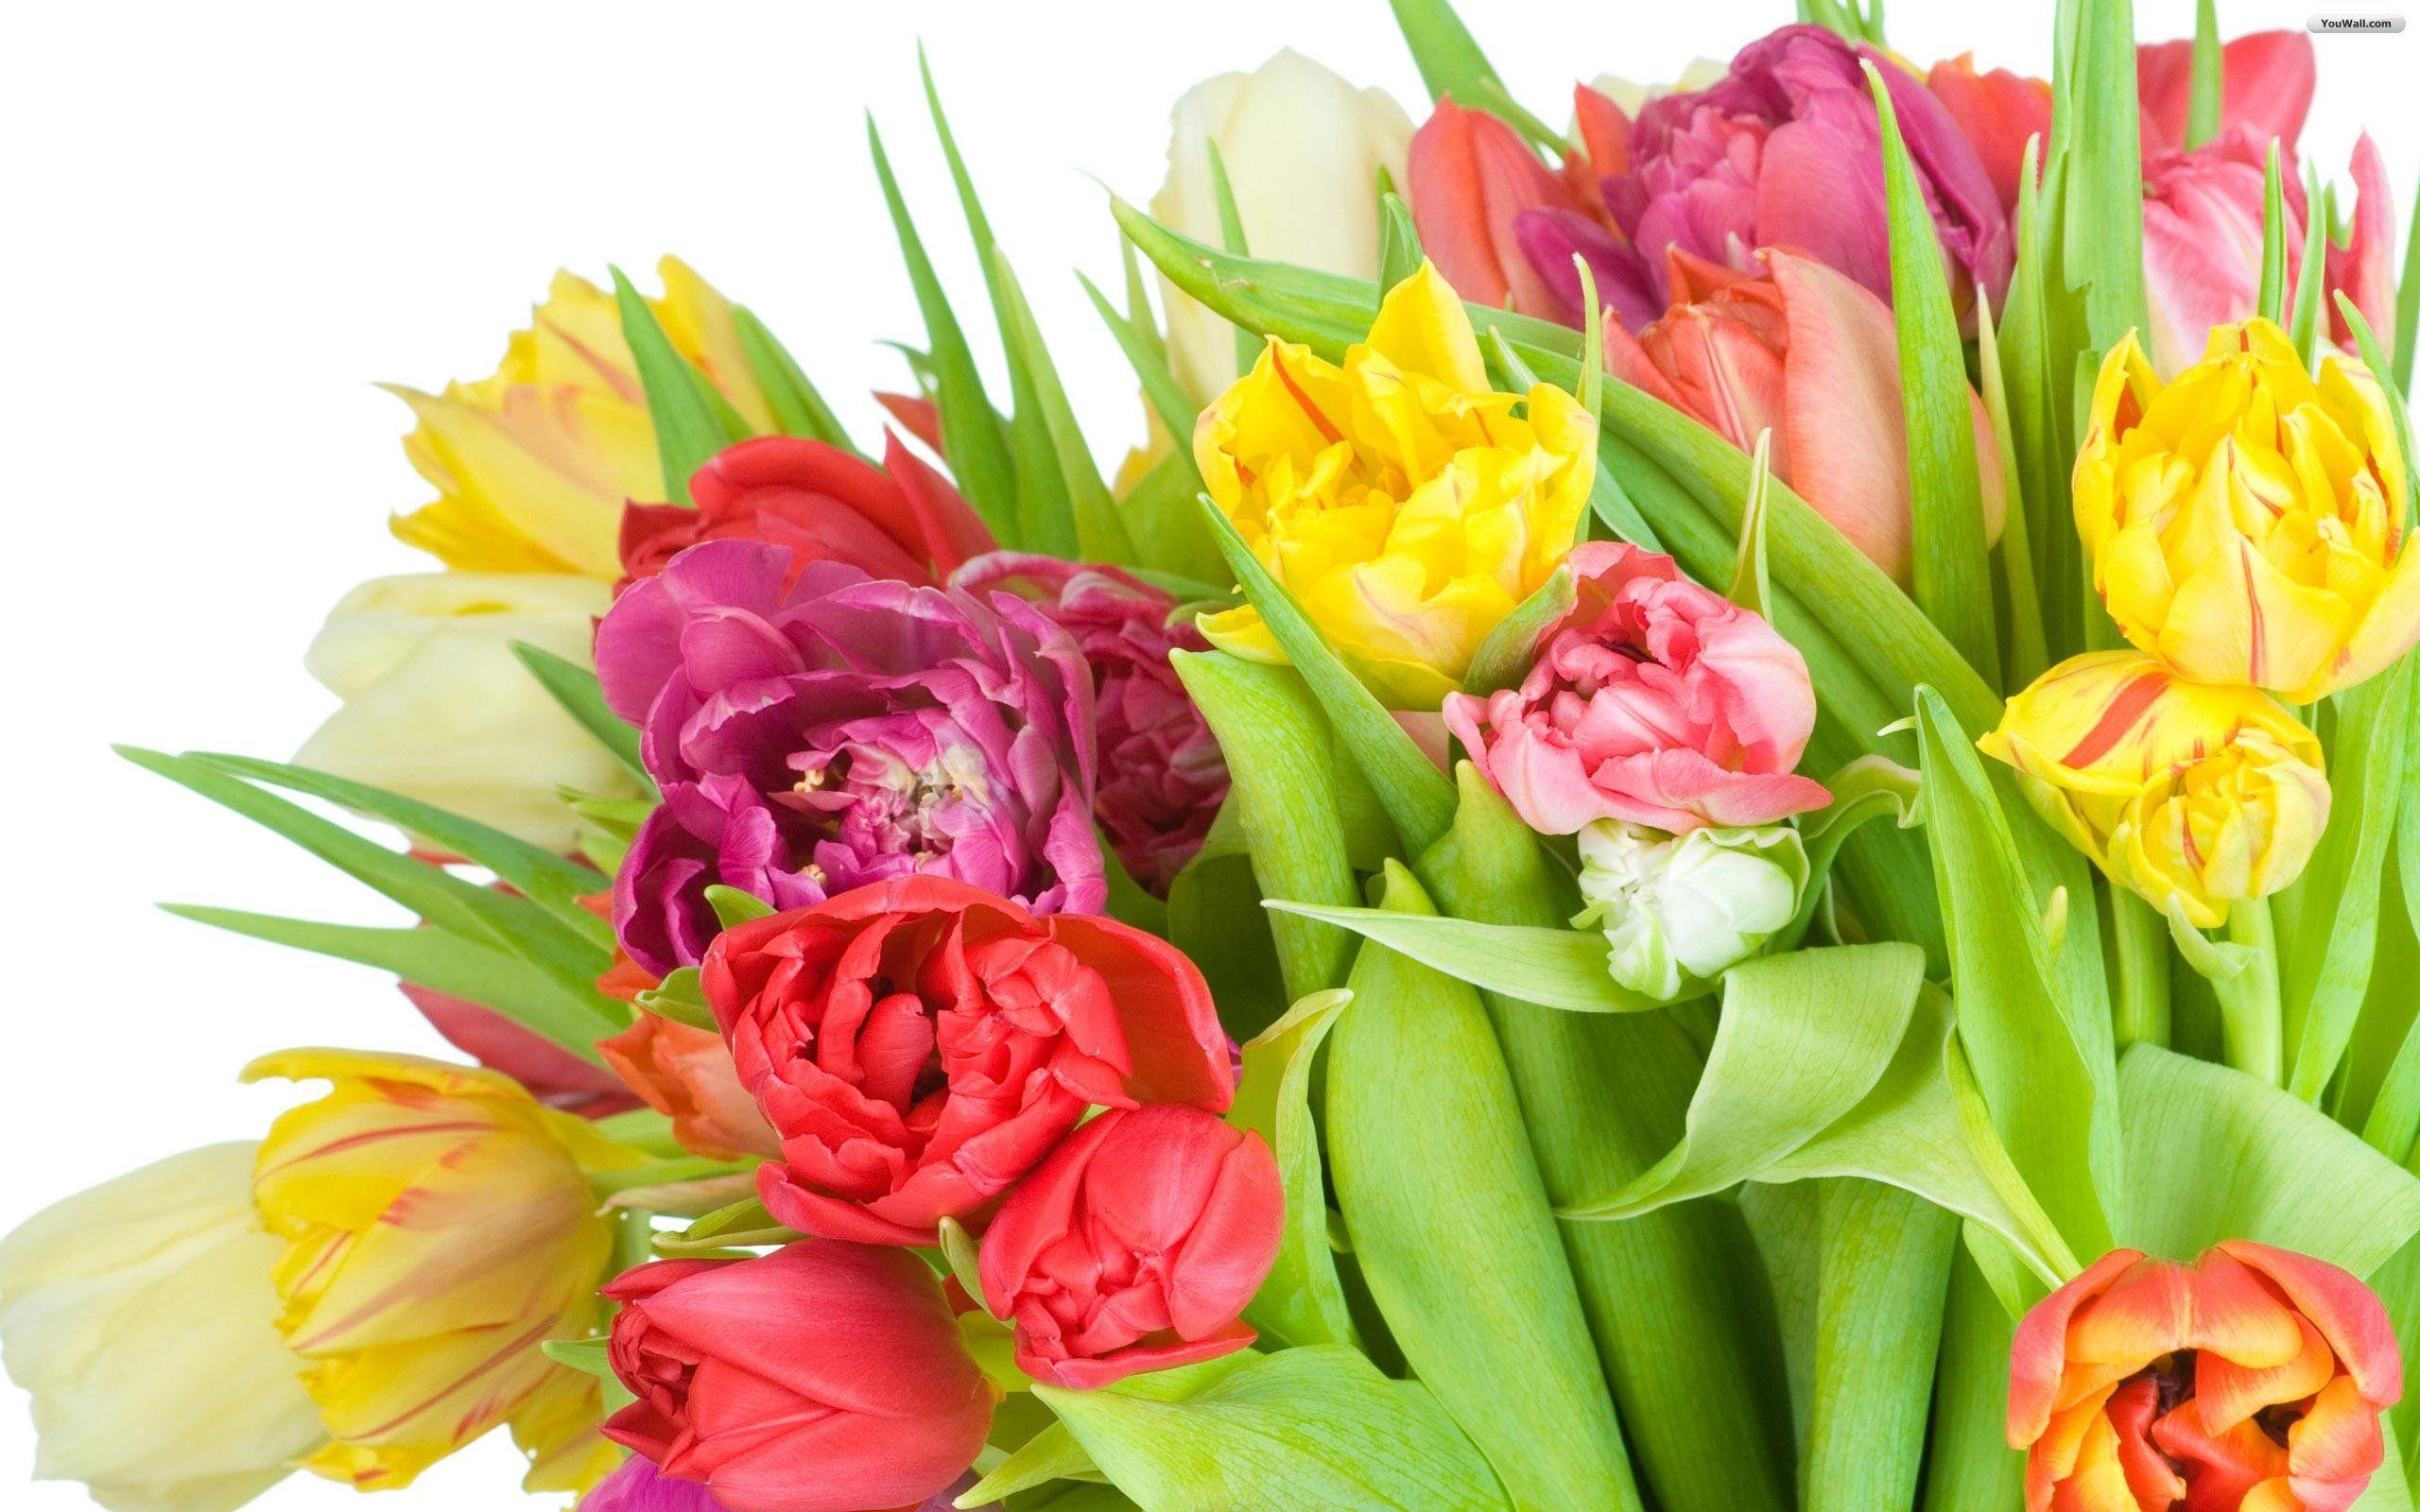 Tulip flowers hd wallpapers free download hd wallpapers tulip flowers hd wallpapers free download izmirmasajfo